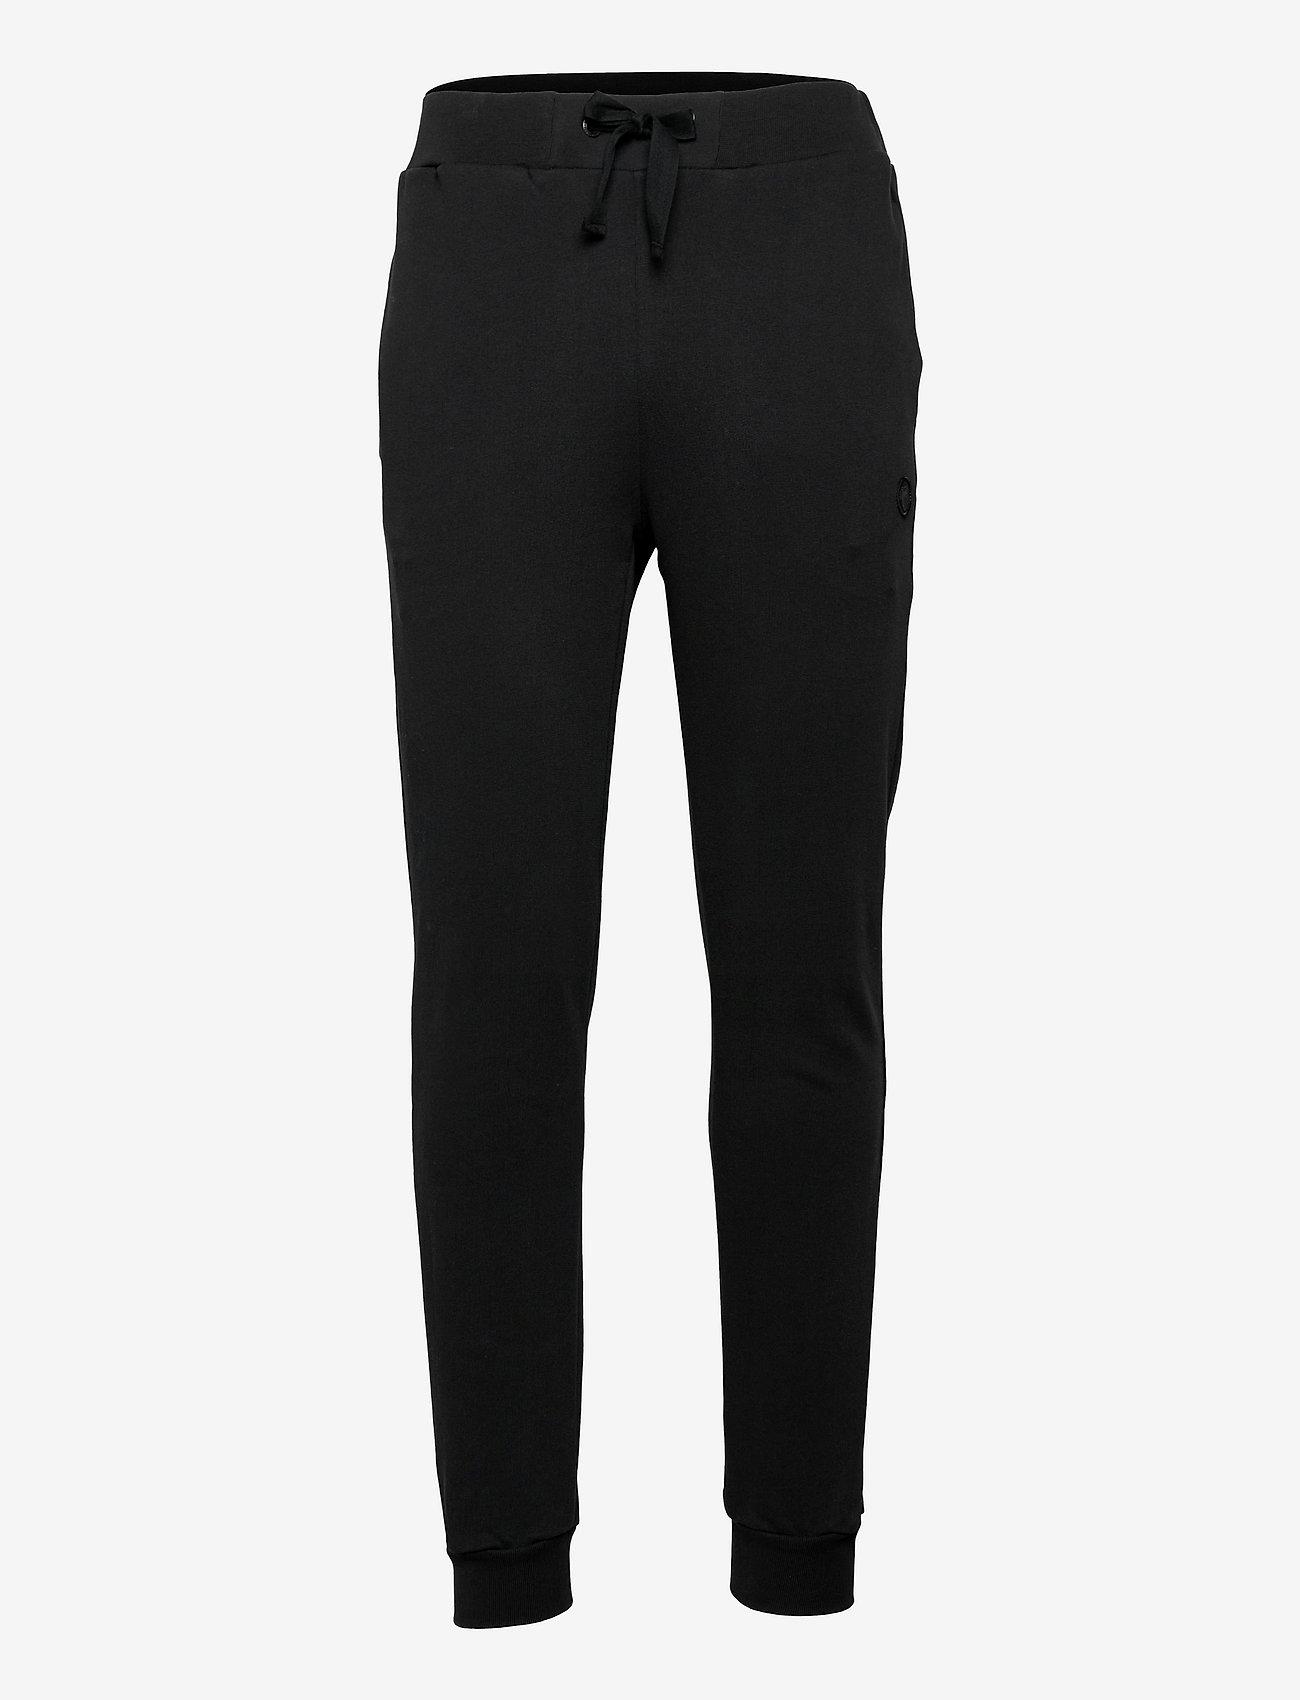 Knowledge Cotton Apparel - TEAK sweat pants - GOTS/Vegan - kleding - black jet - 0